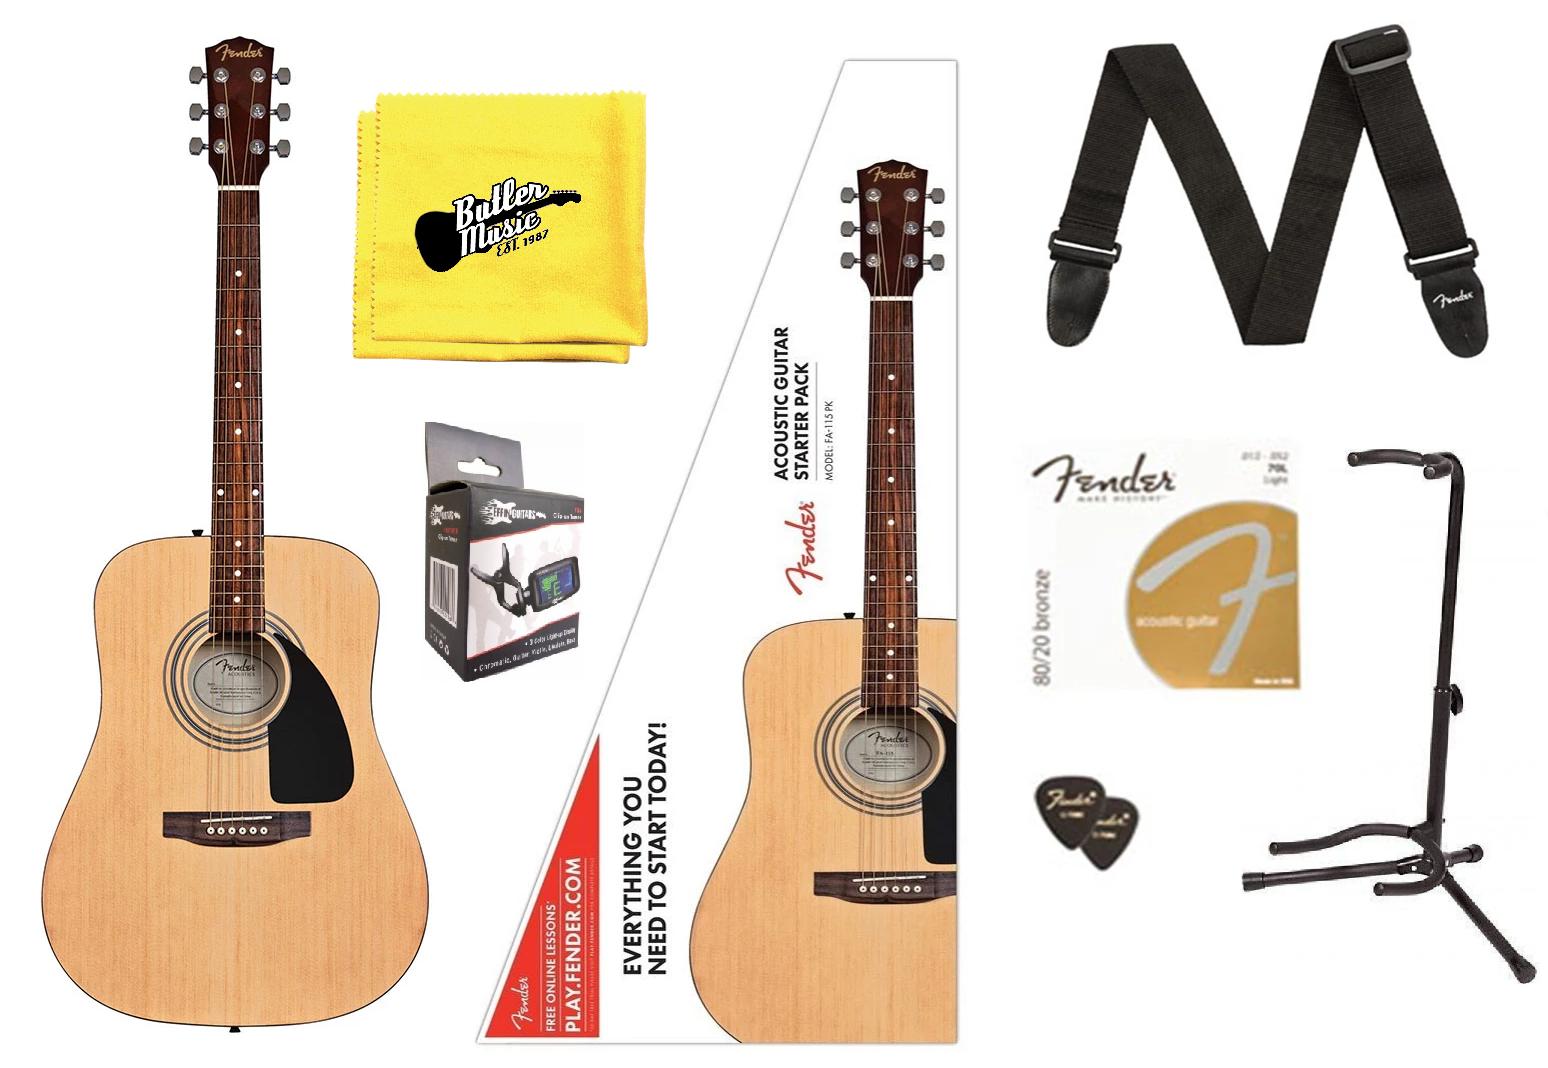 Fender FA-115 Full Größe Dreadnought Spruce Top Acoustic Guitar SUPER Player Pack